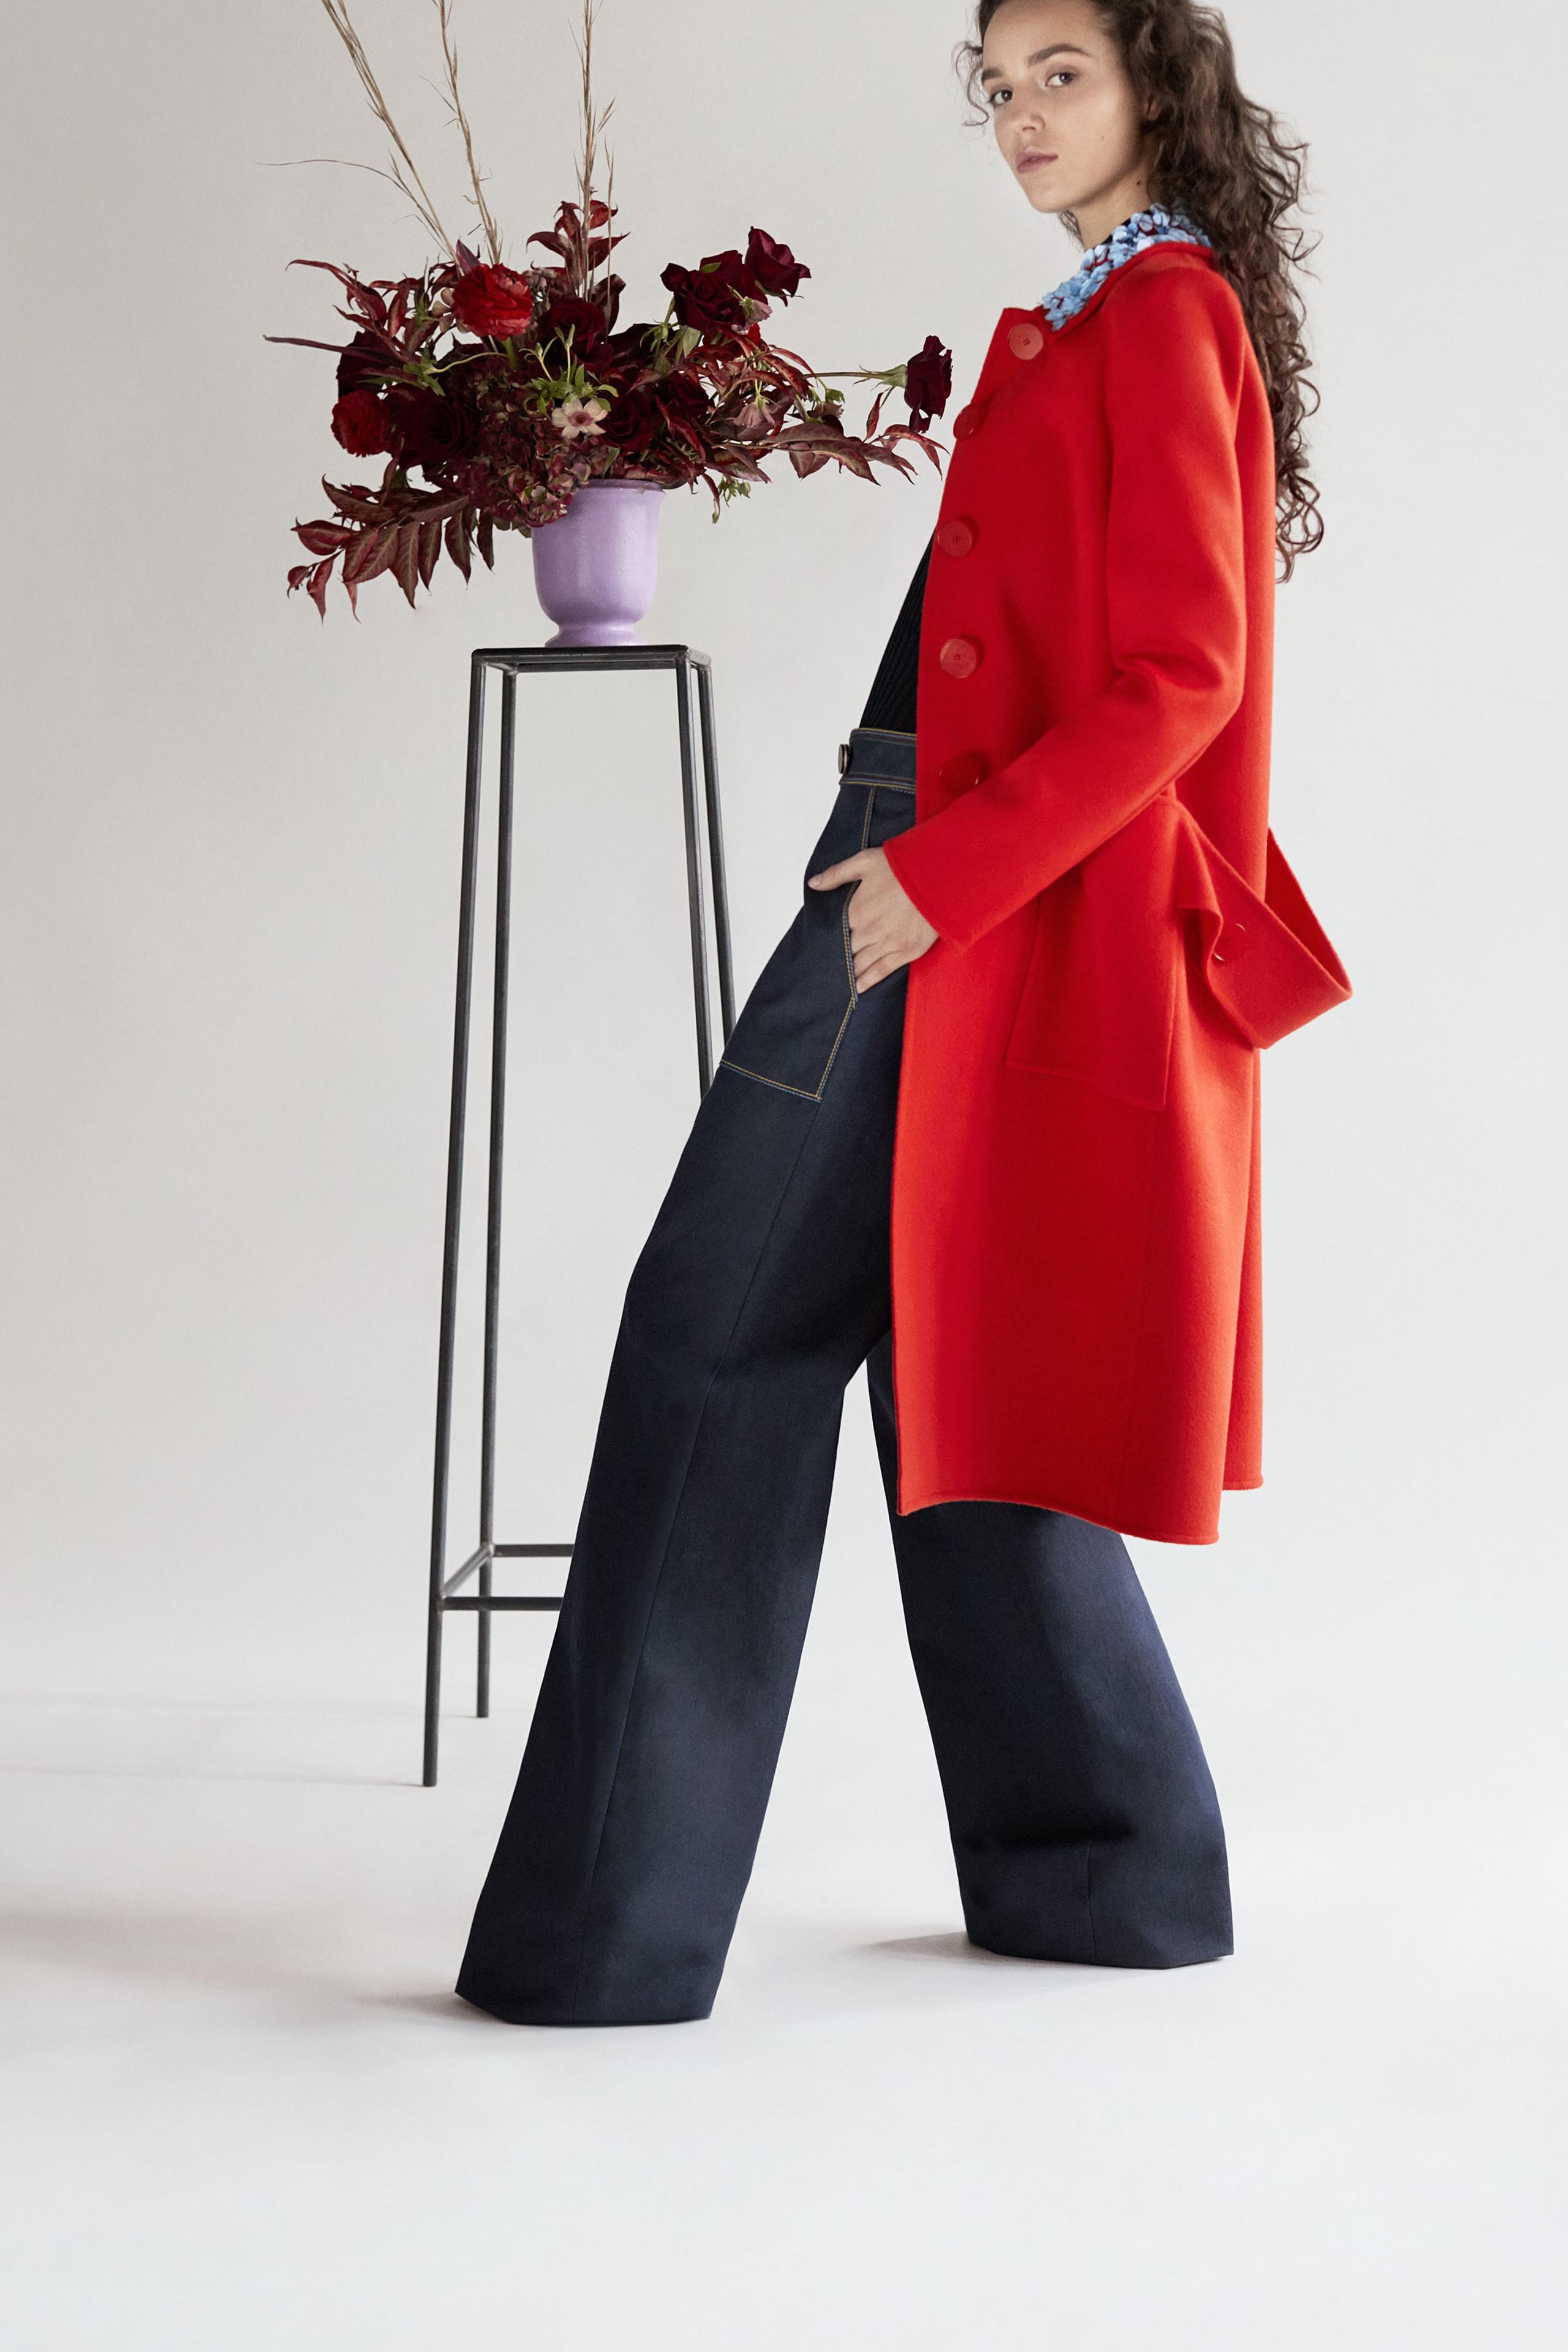 Foto de Carolina Herrera NY Pre Fall 2018: una maravillosa colección de Alta Costura (16/33)